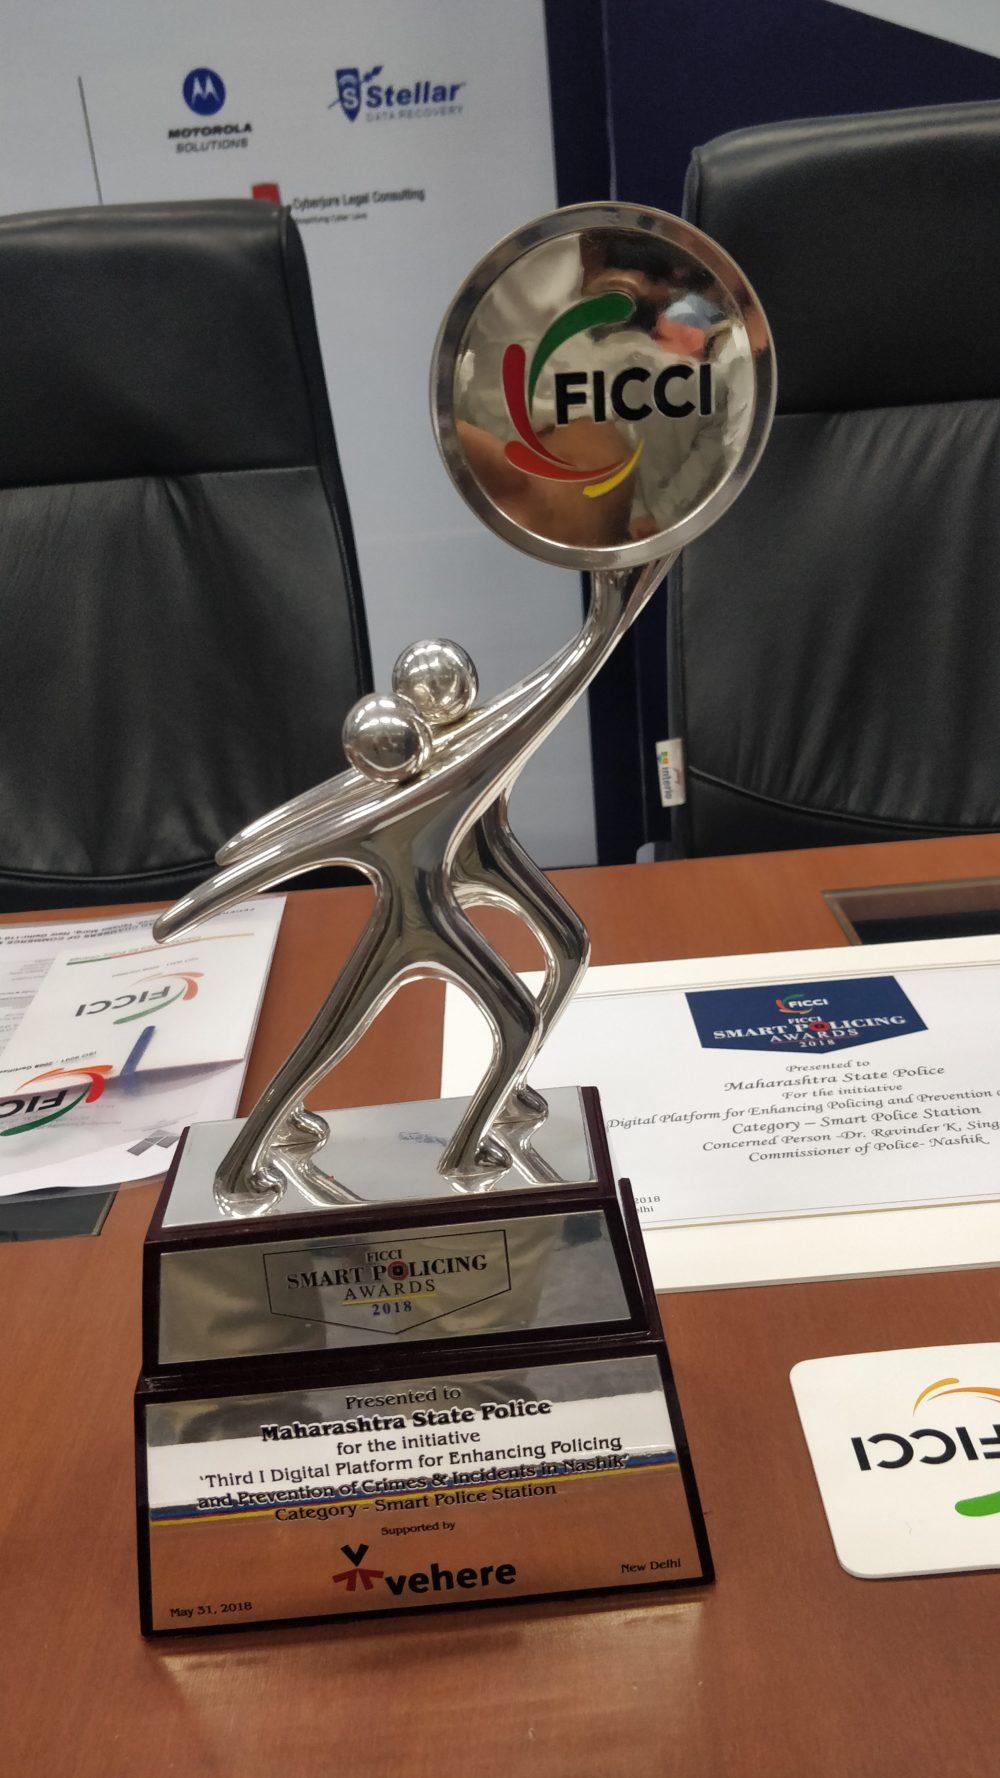 FICCI's Smart Policing Award